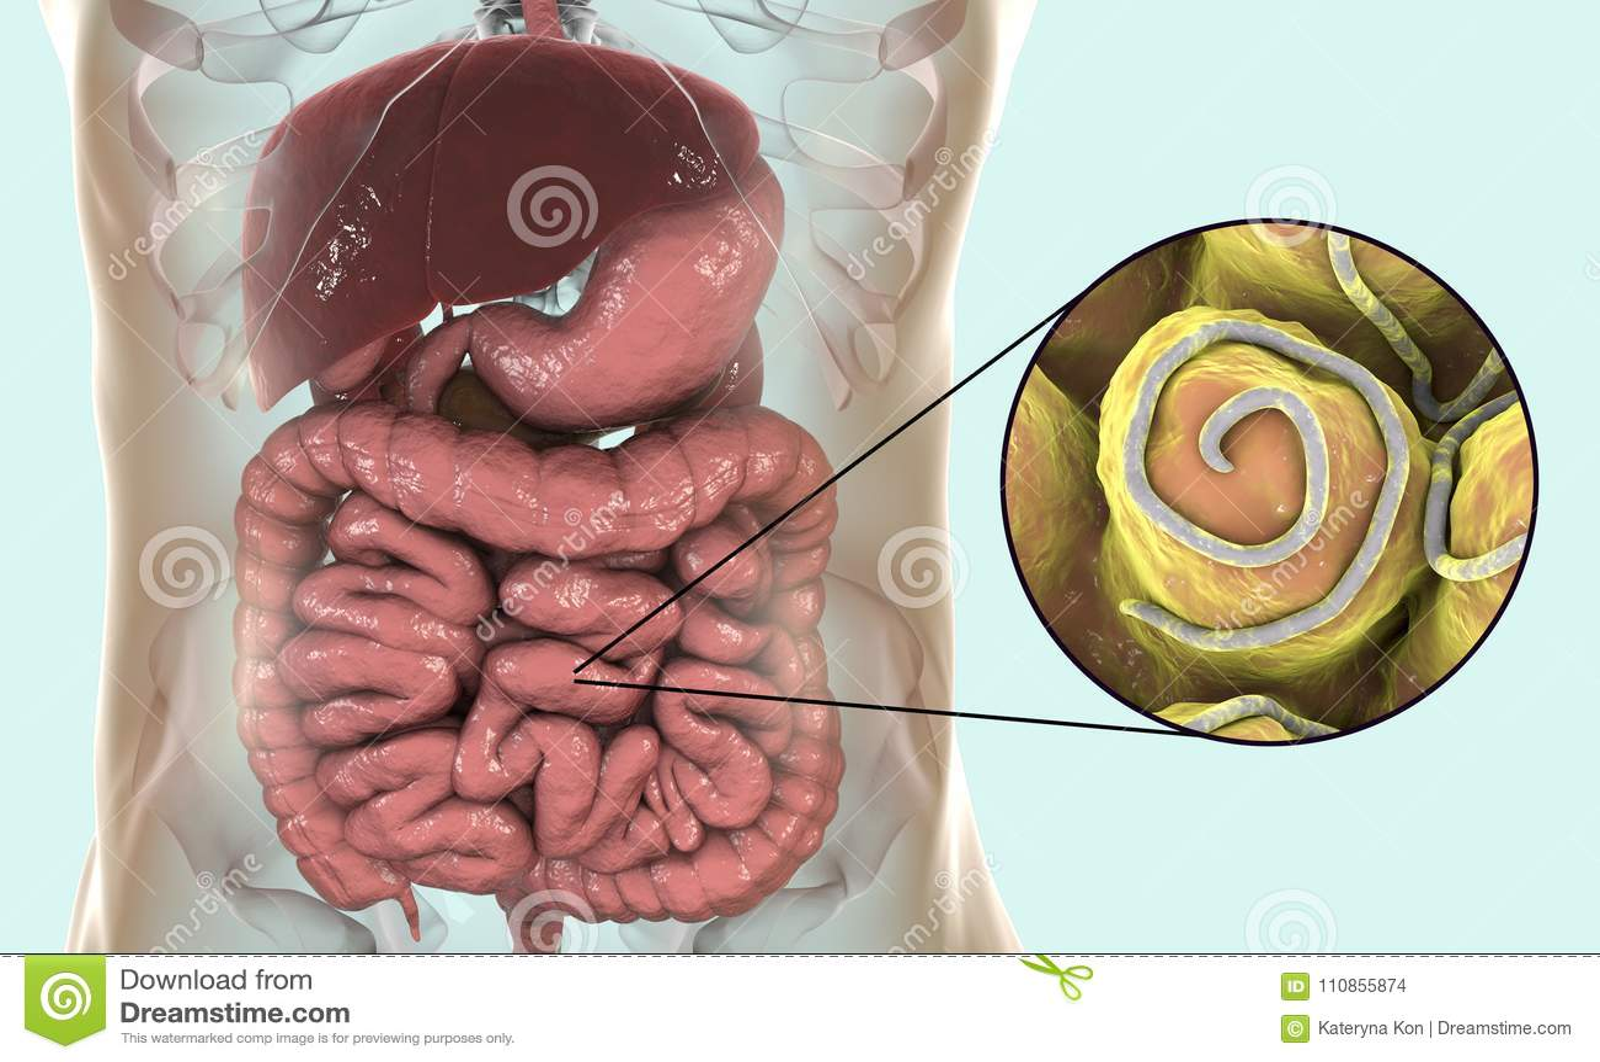 papilomavirusuri umane